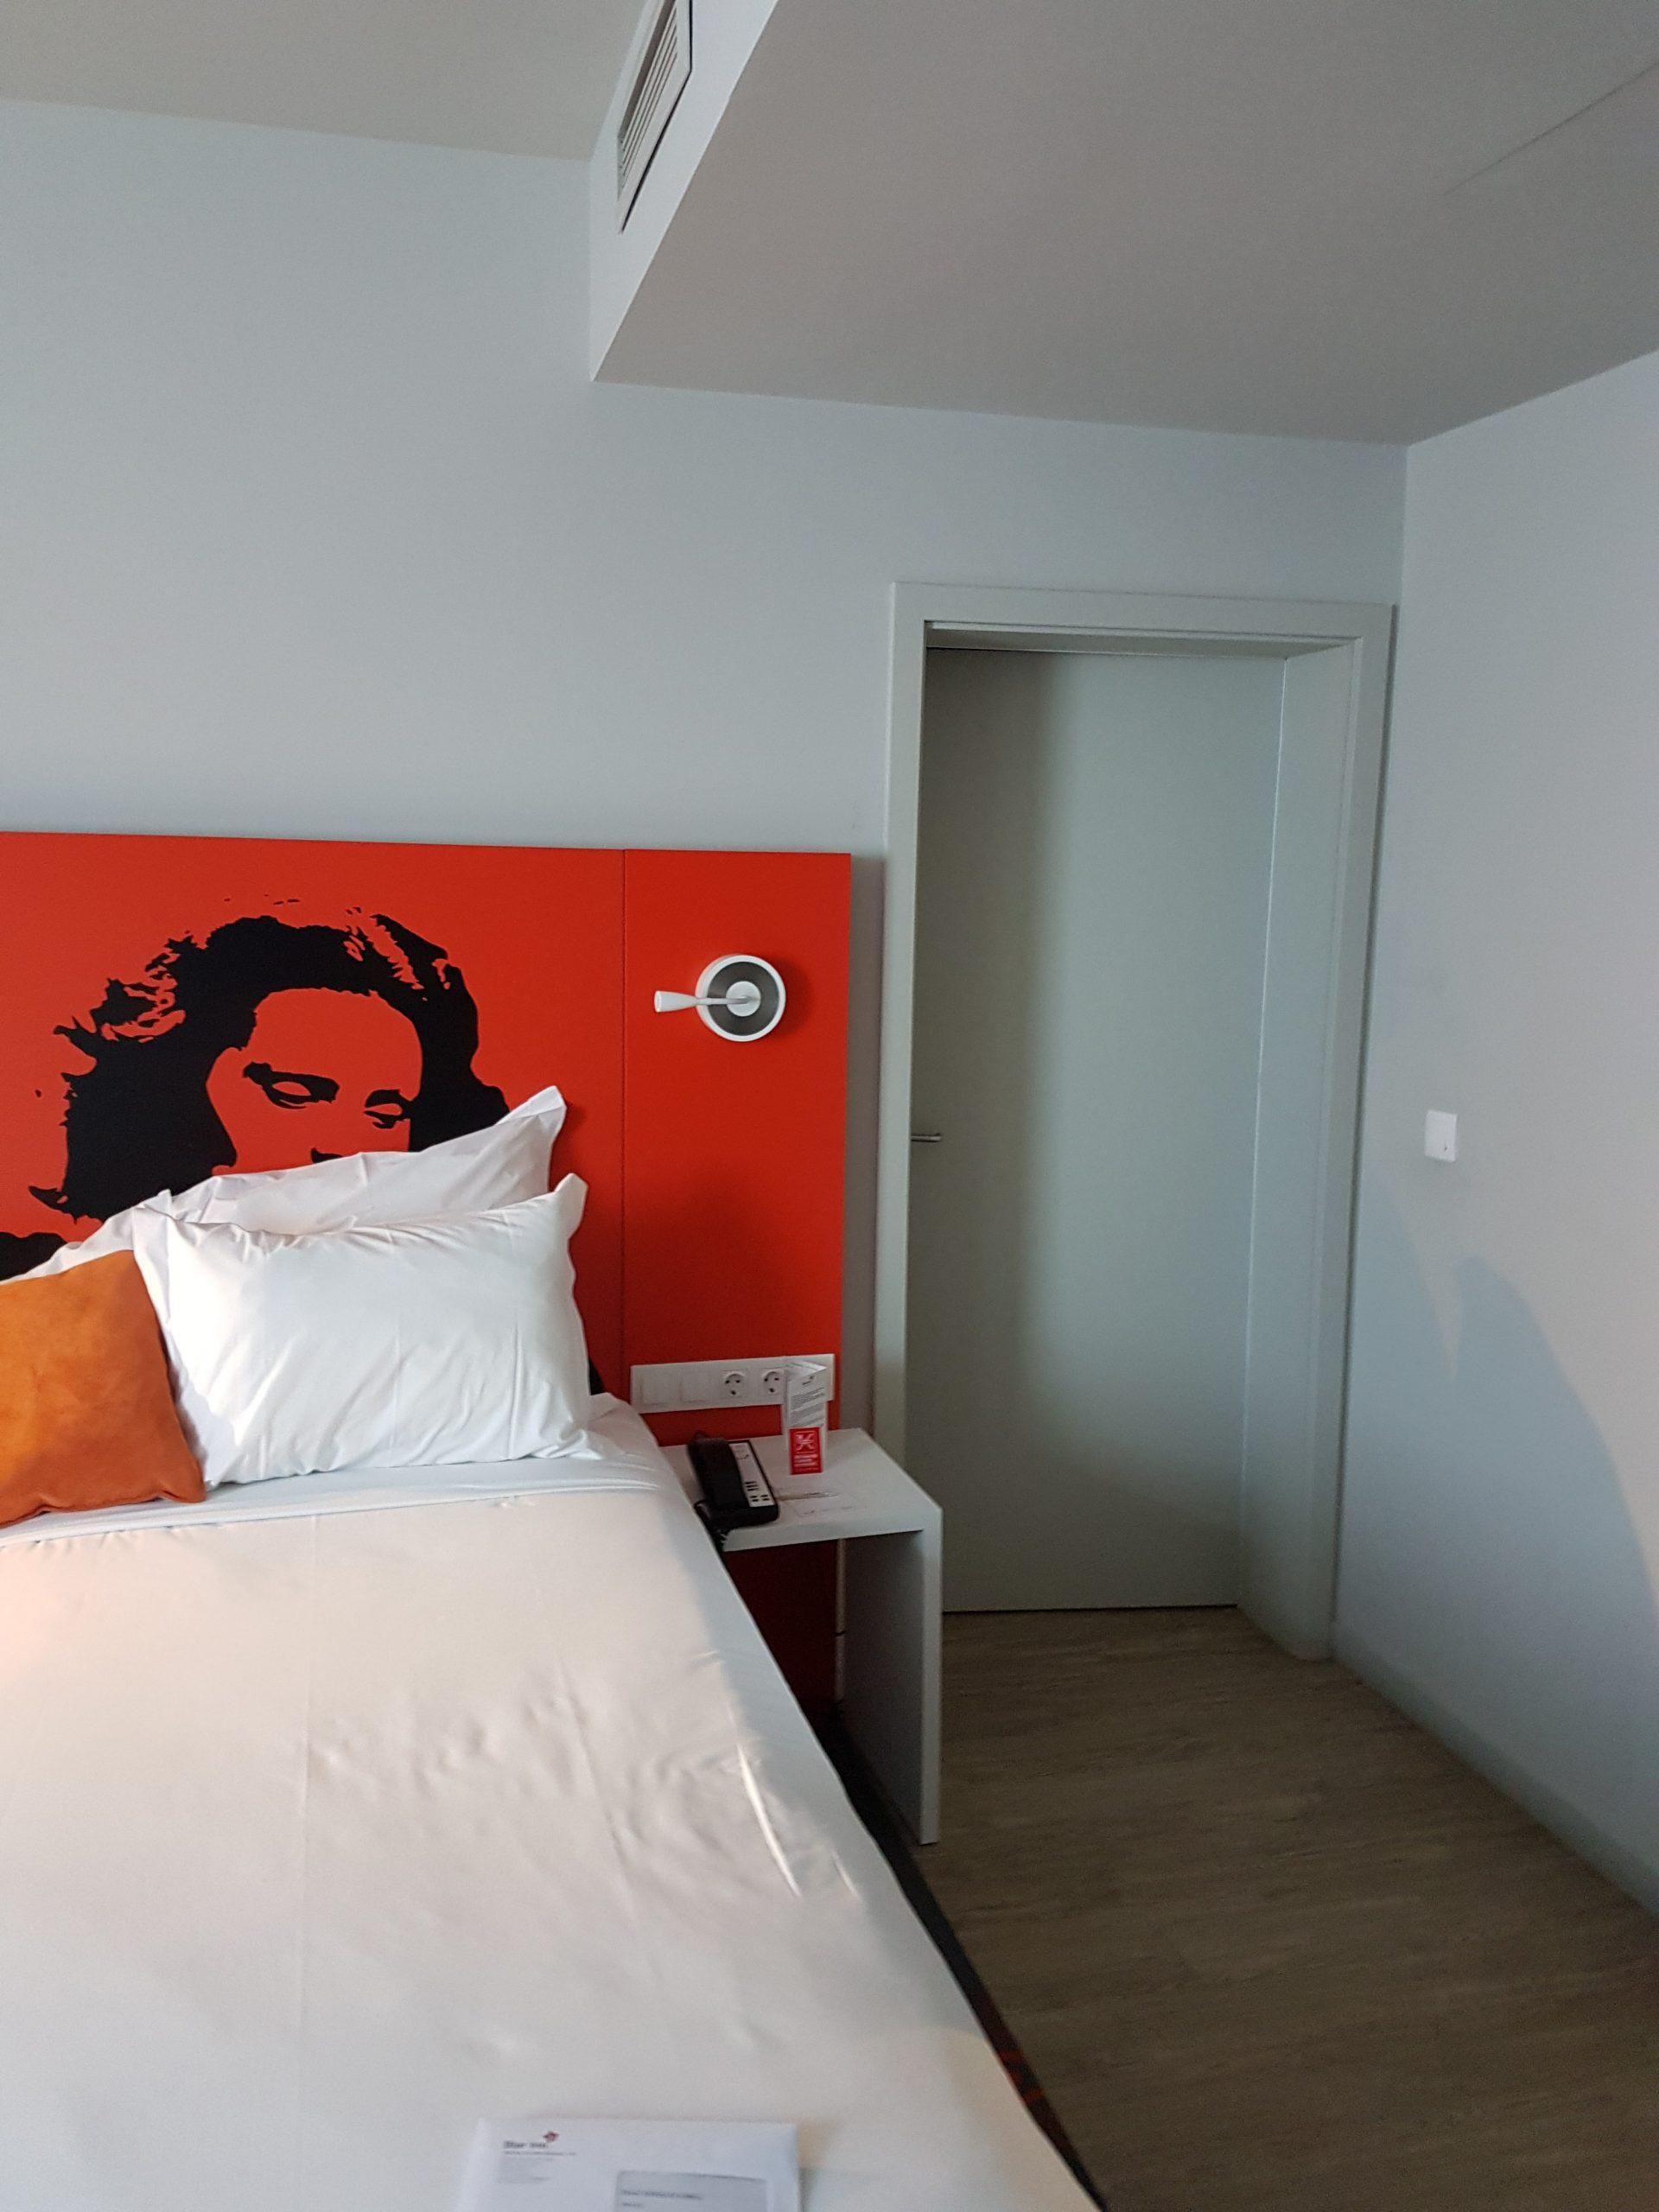 viaje a Portugal, habitación del hotel Star Inn de Lisboa